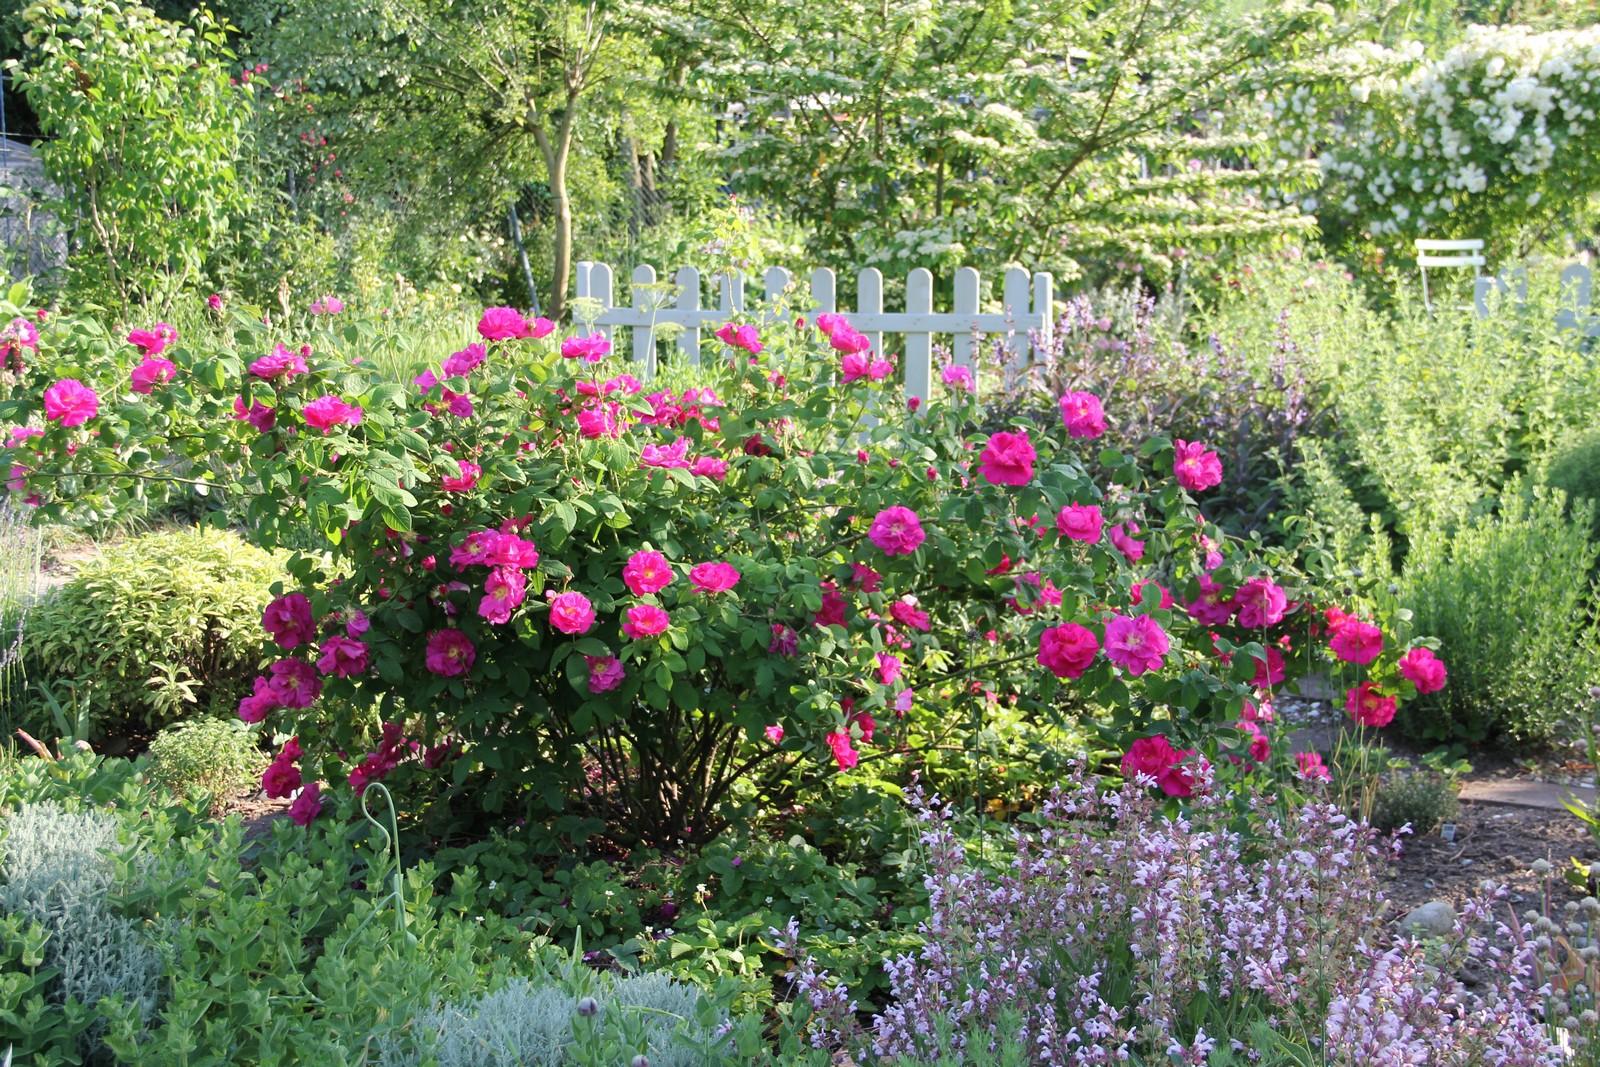 Rosa x gallica var. officinalis